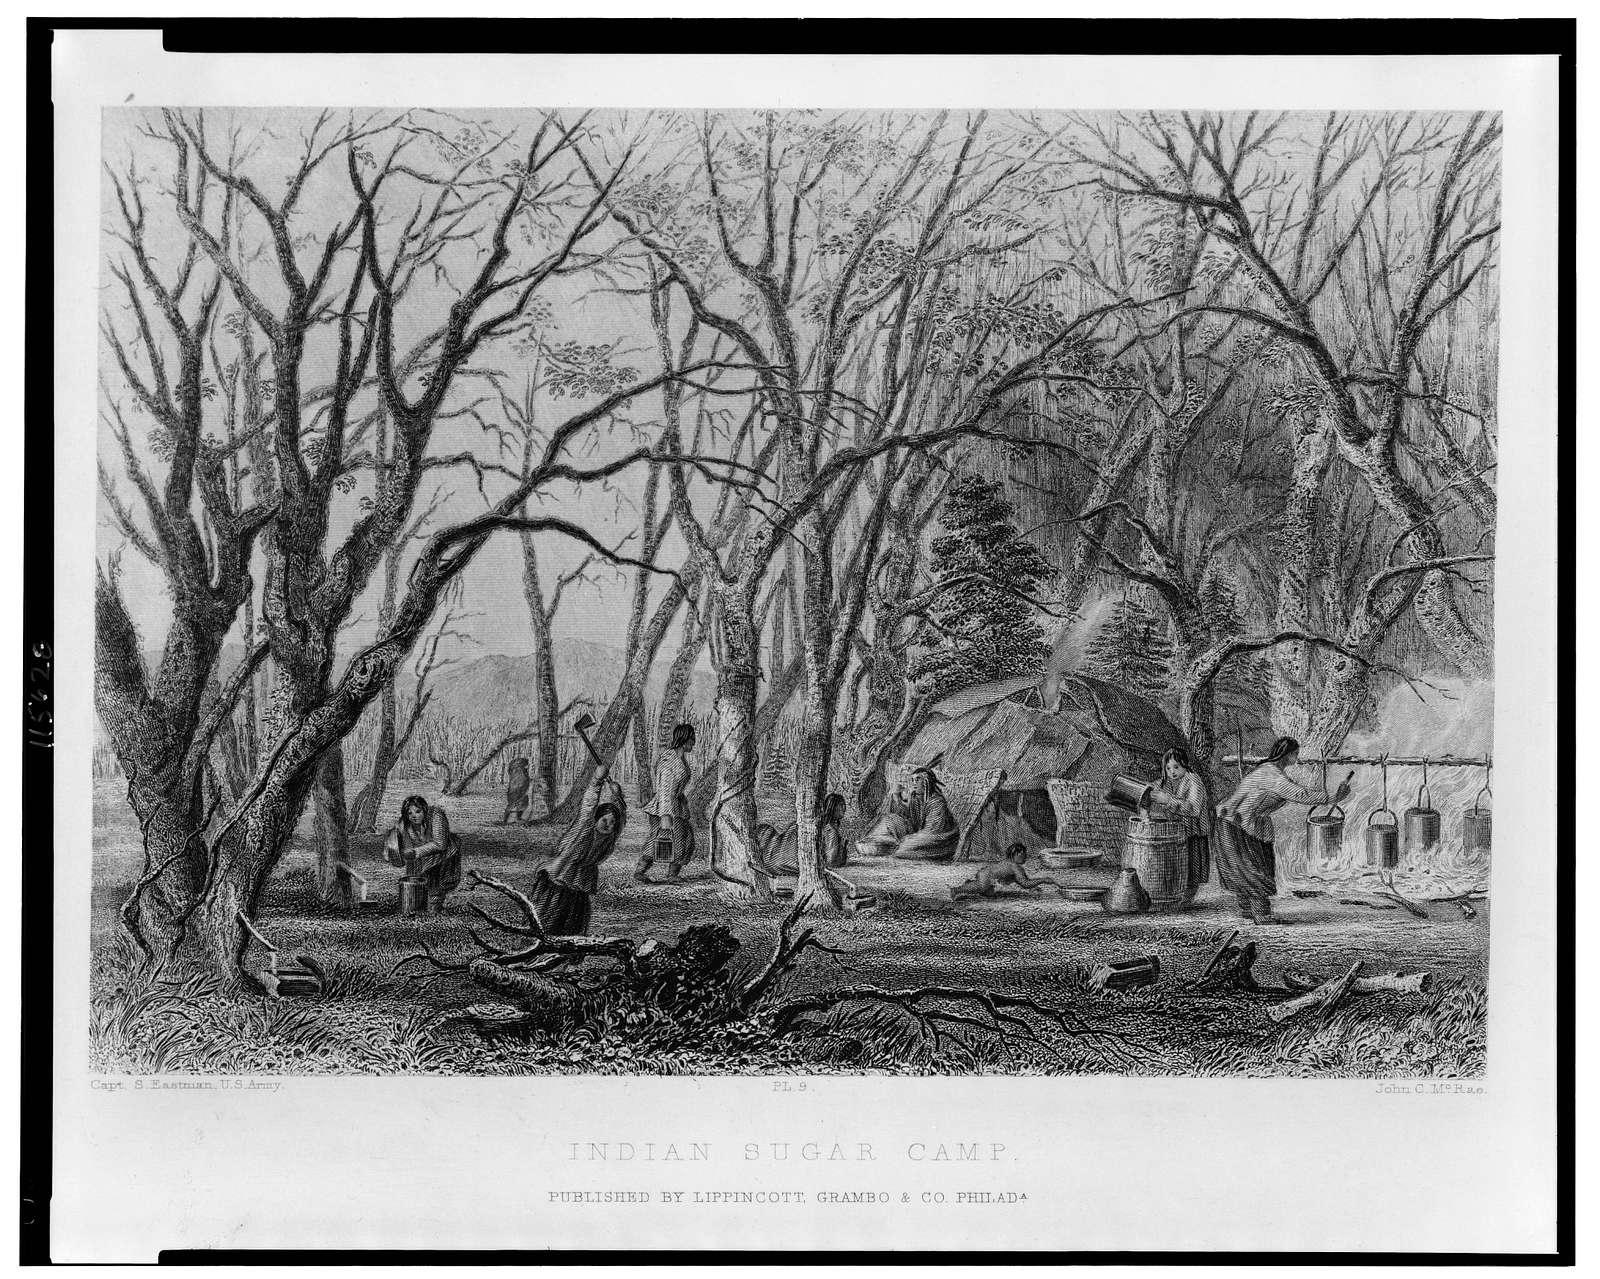 Indian sugar camp / Capt. S. Eastman, U.S. Army ; John C. McRae.